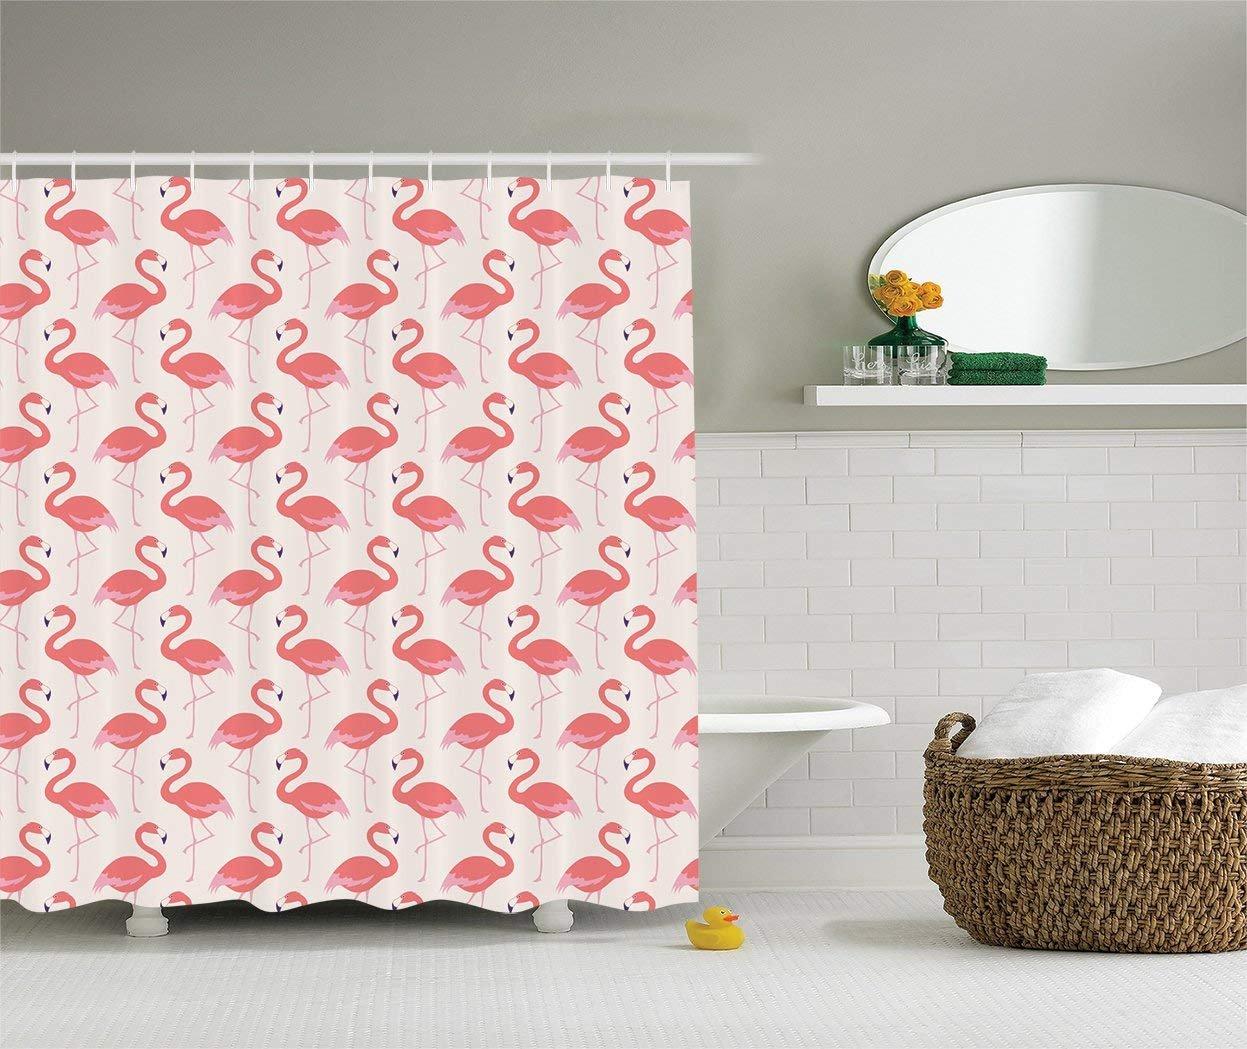 Ambesonne flamingo decor collection ornamental feminine bird design and seamless flamingos image pattern polyester fabric bathroom shower curtain set